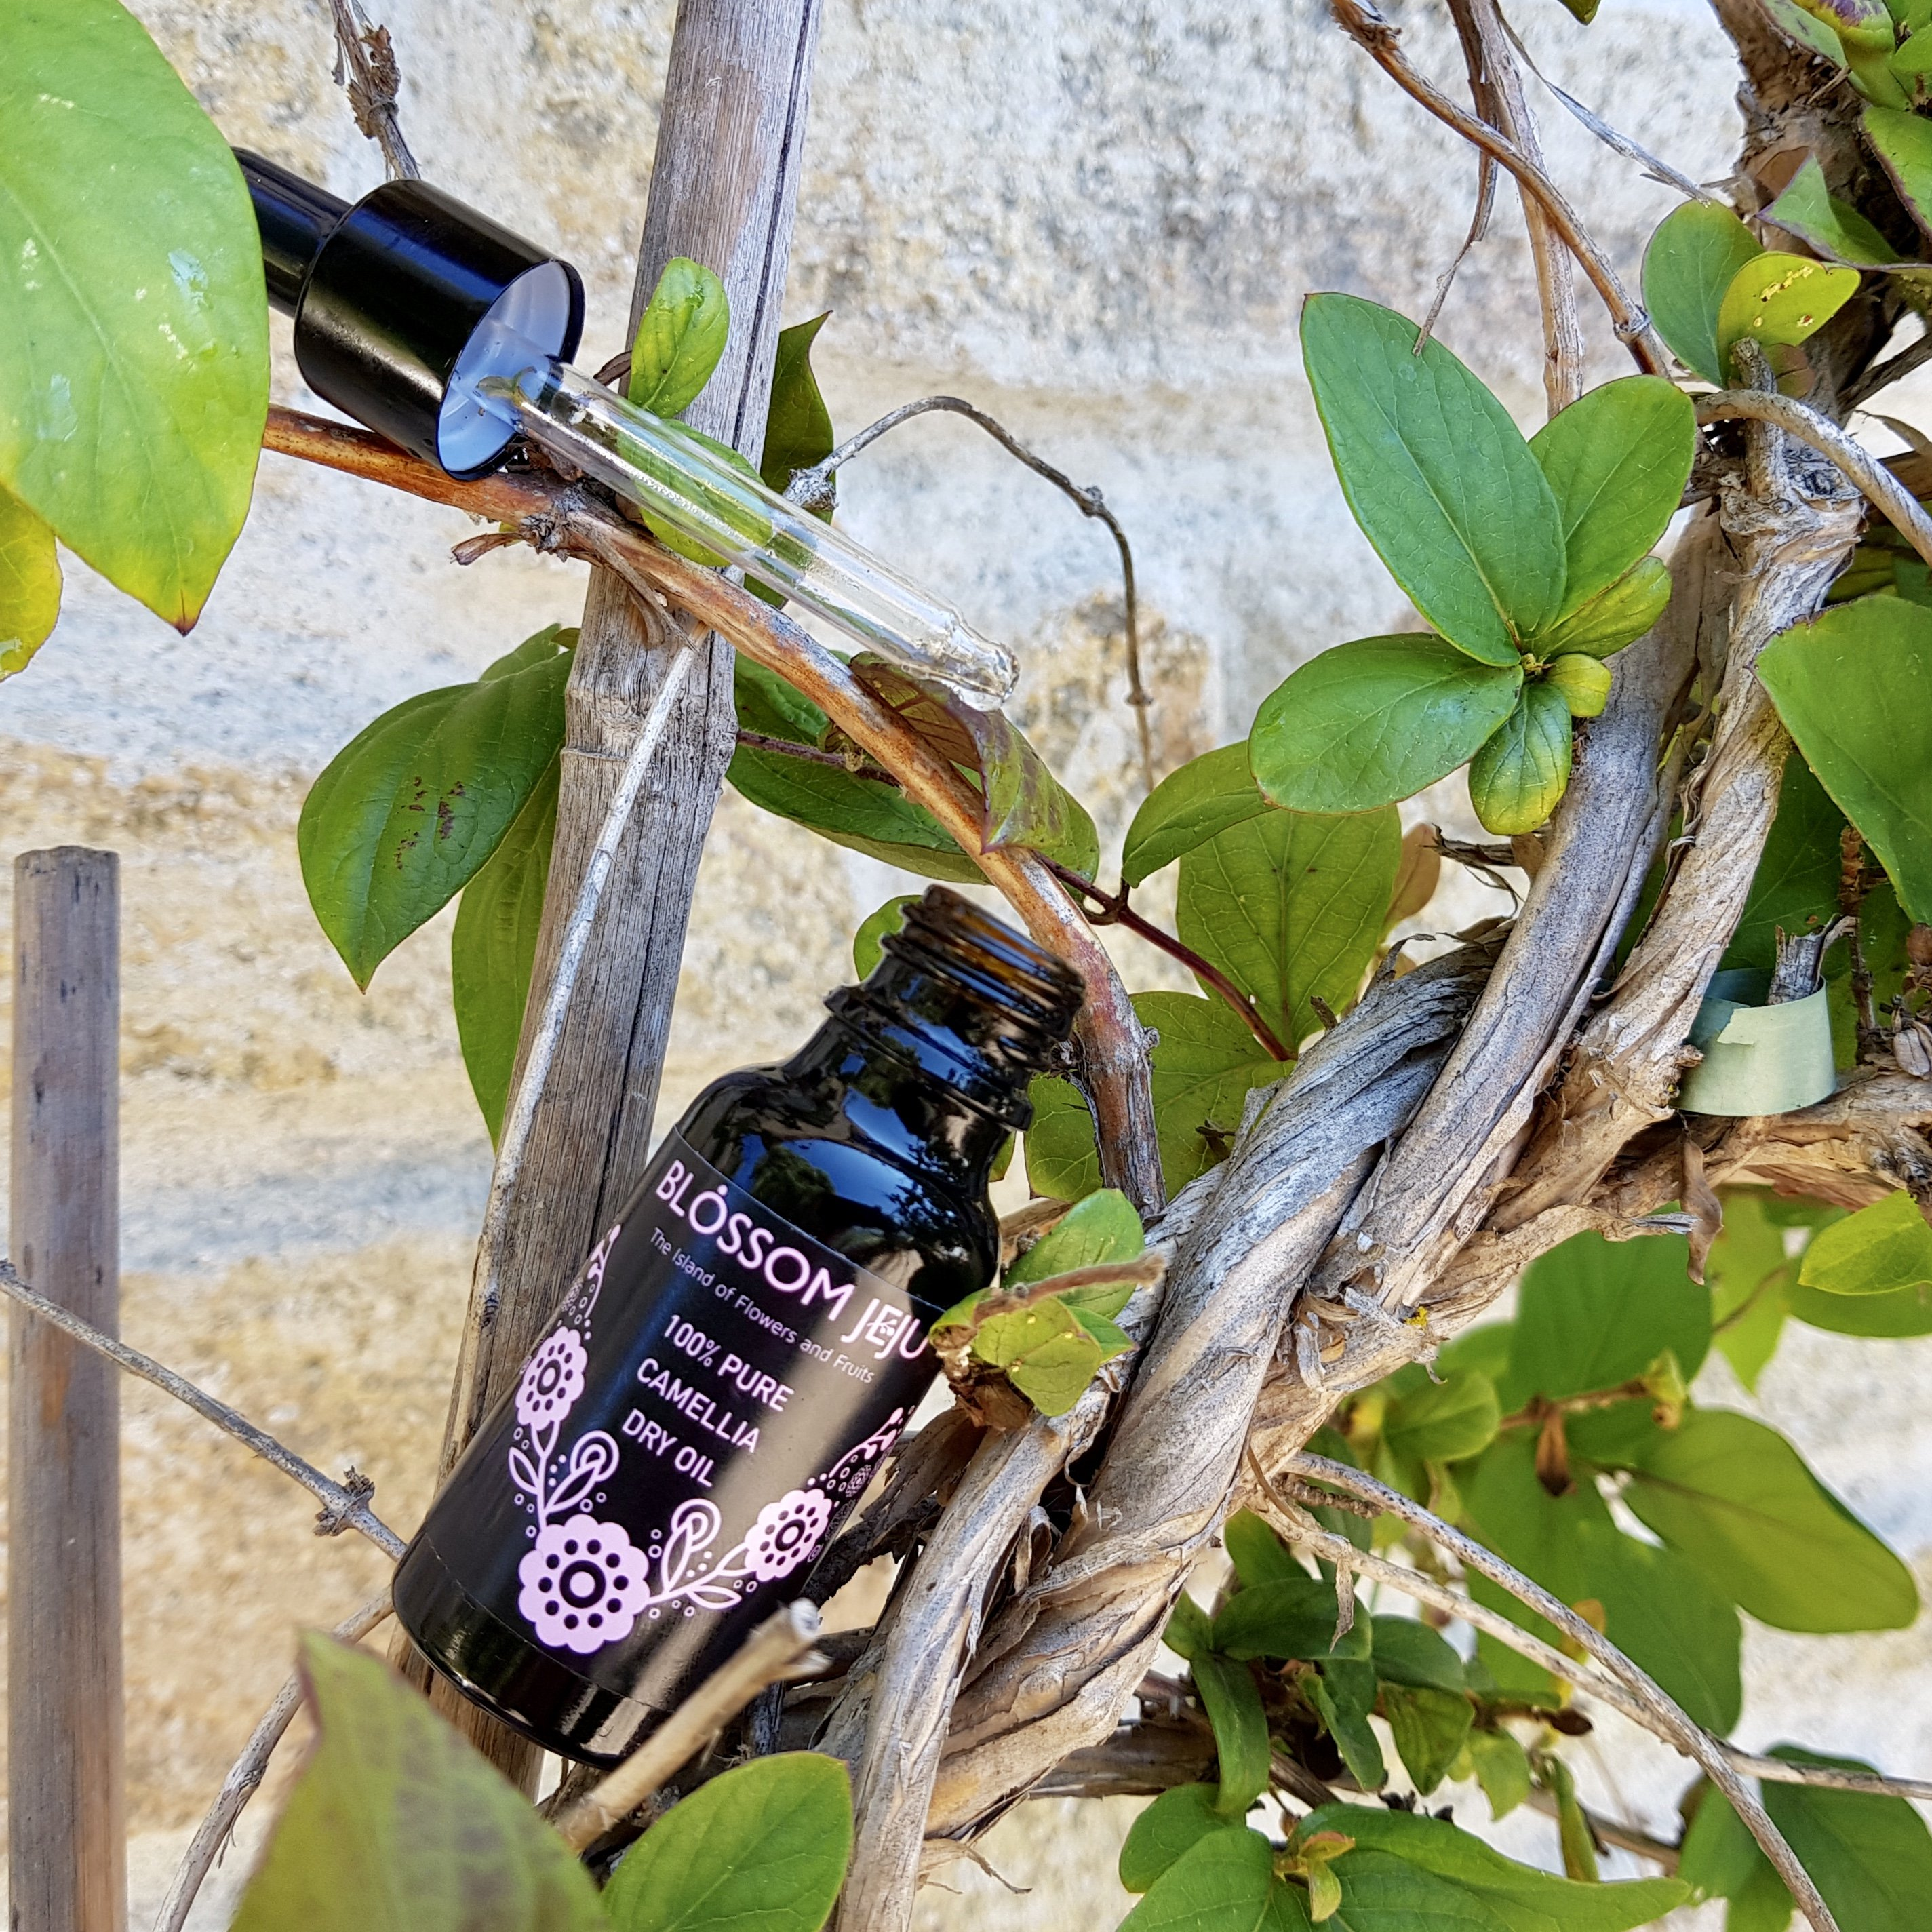 Korean skincare Blossom Jeju 100% Camellia Seed Dry Oil